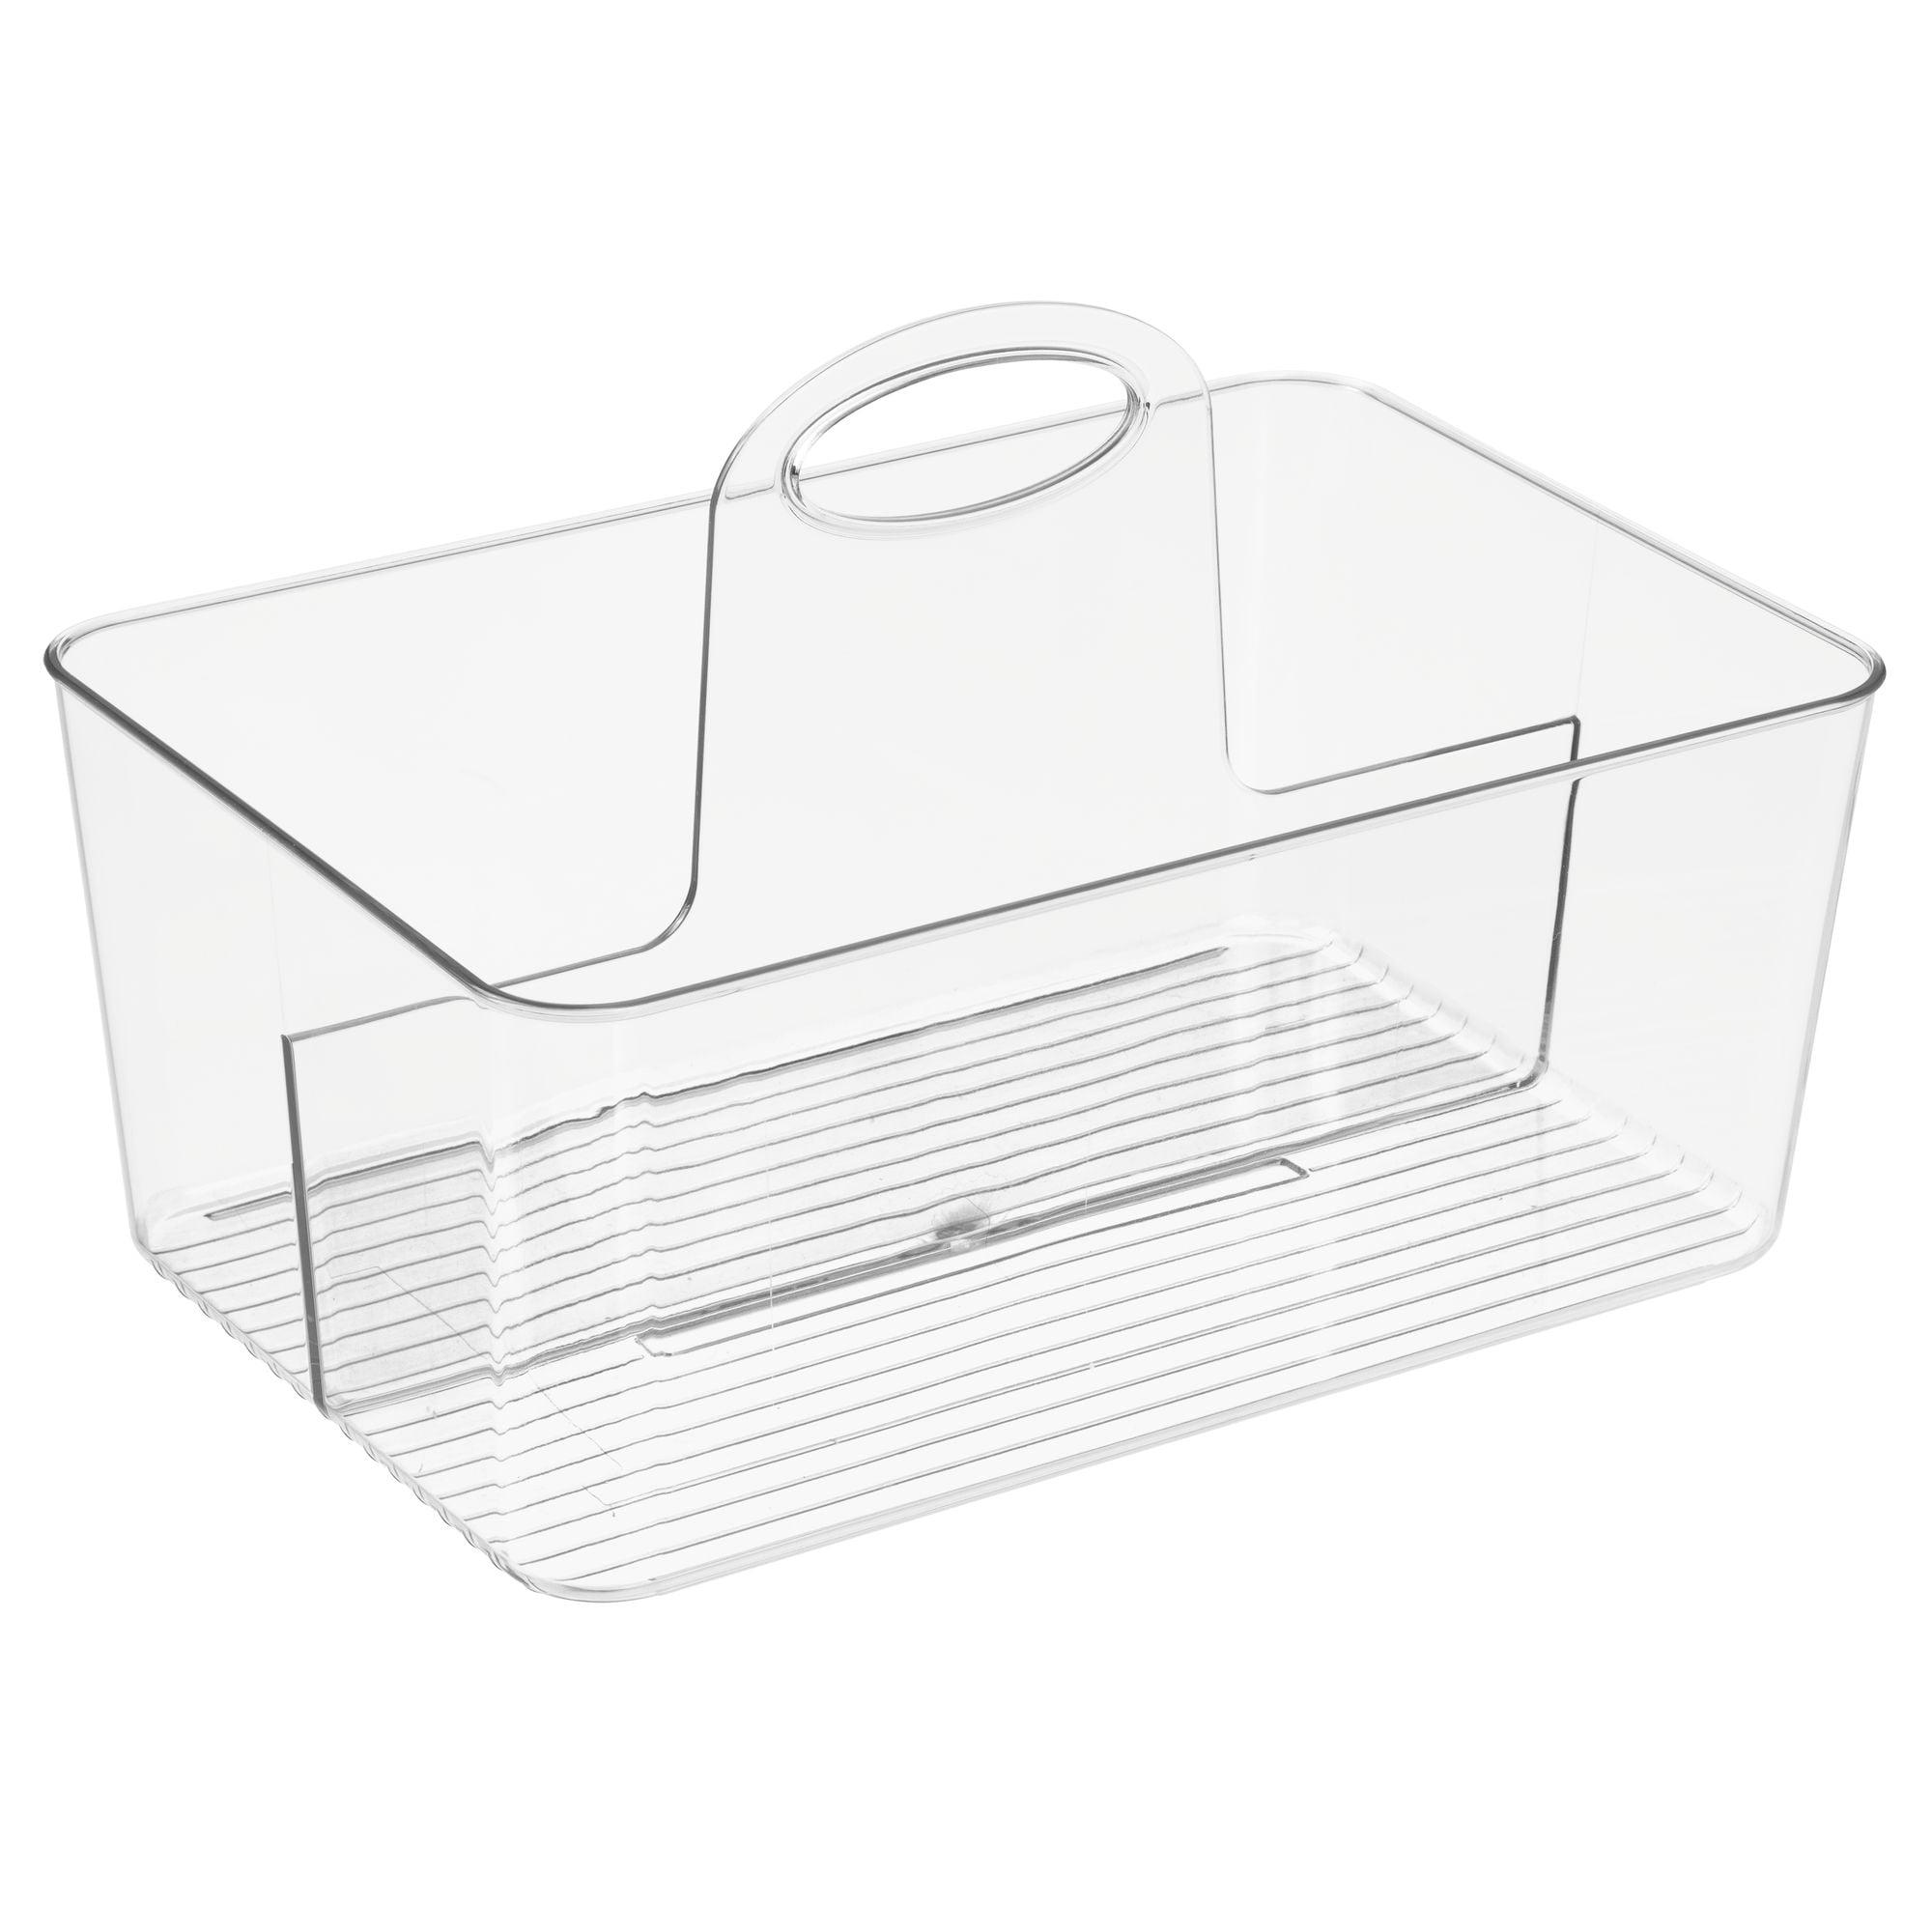 Mainstays Plastic Bath Tote Bin